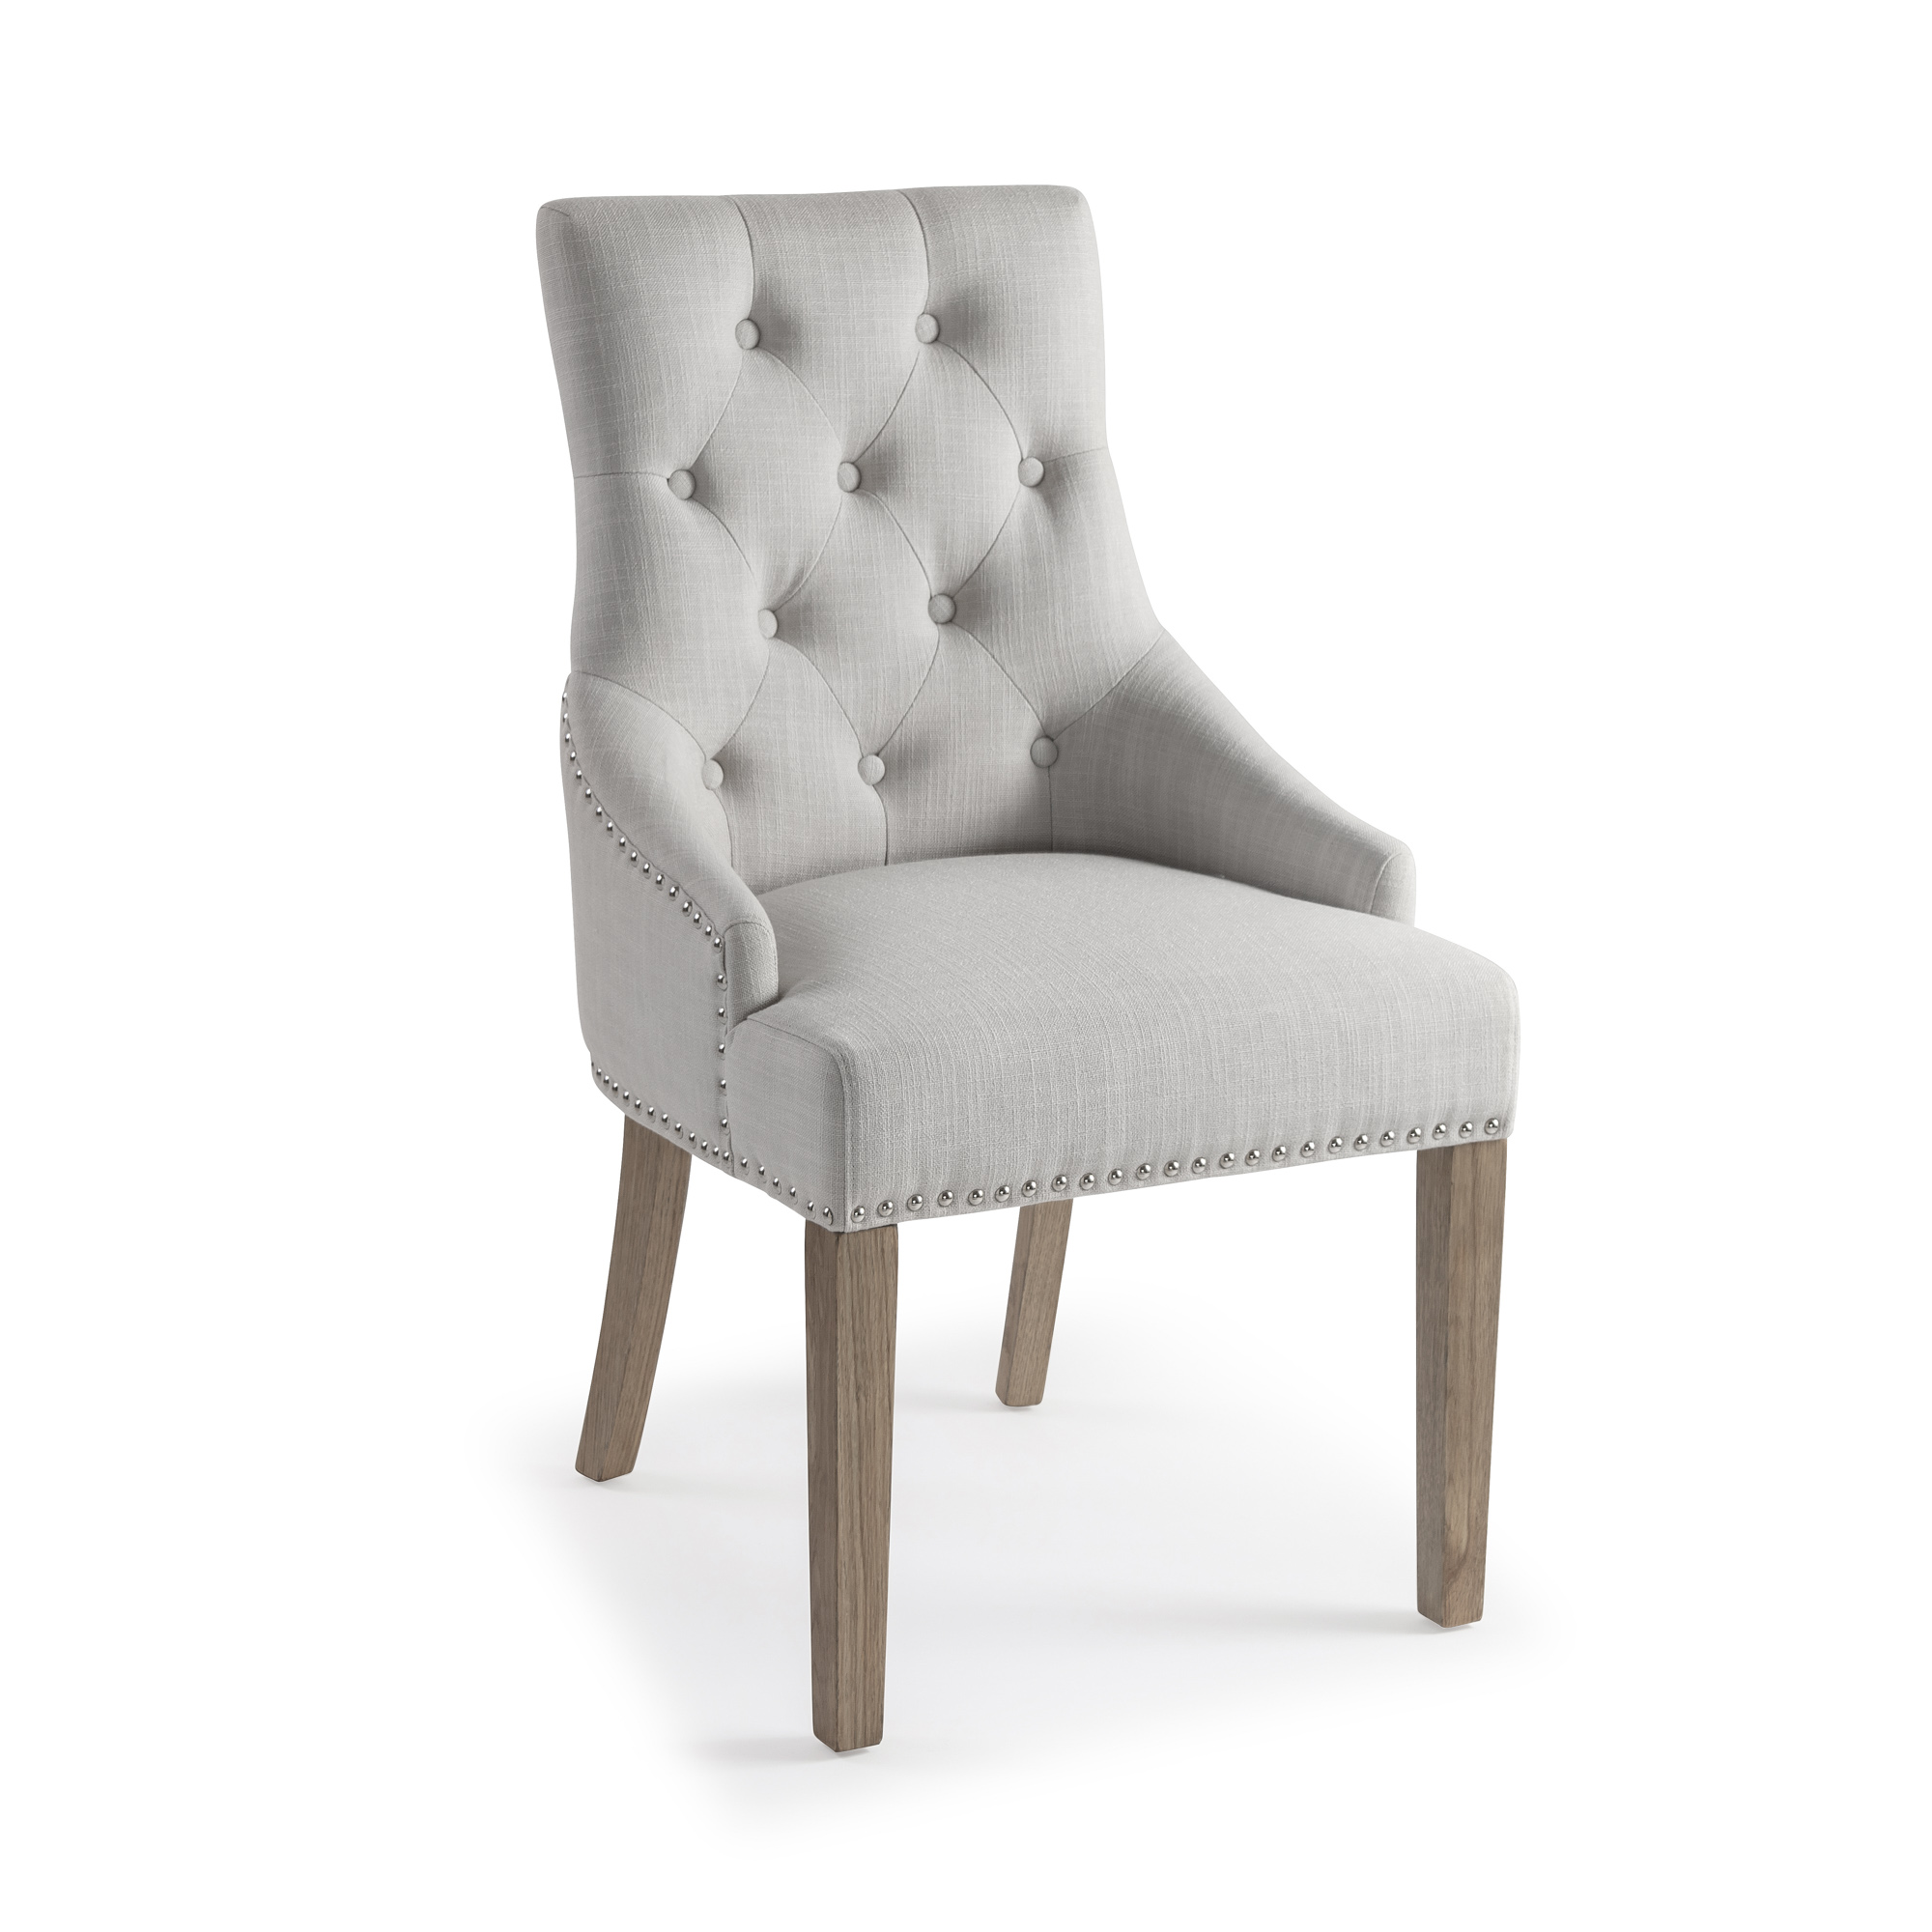 Chelsea Scoop Back Linen Upholstered Dining Chair